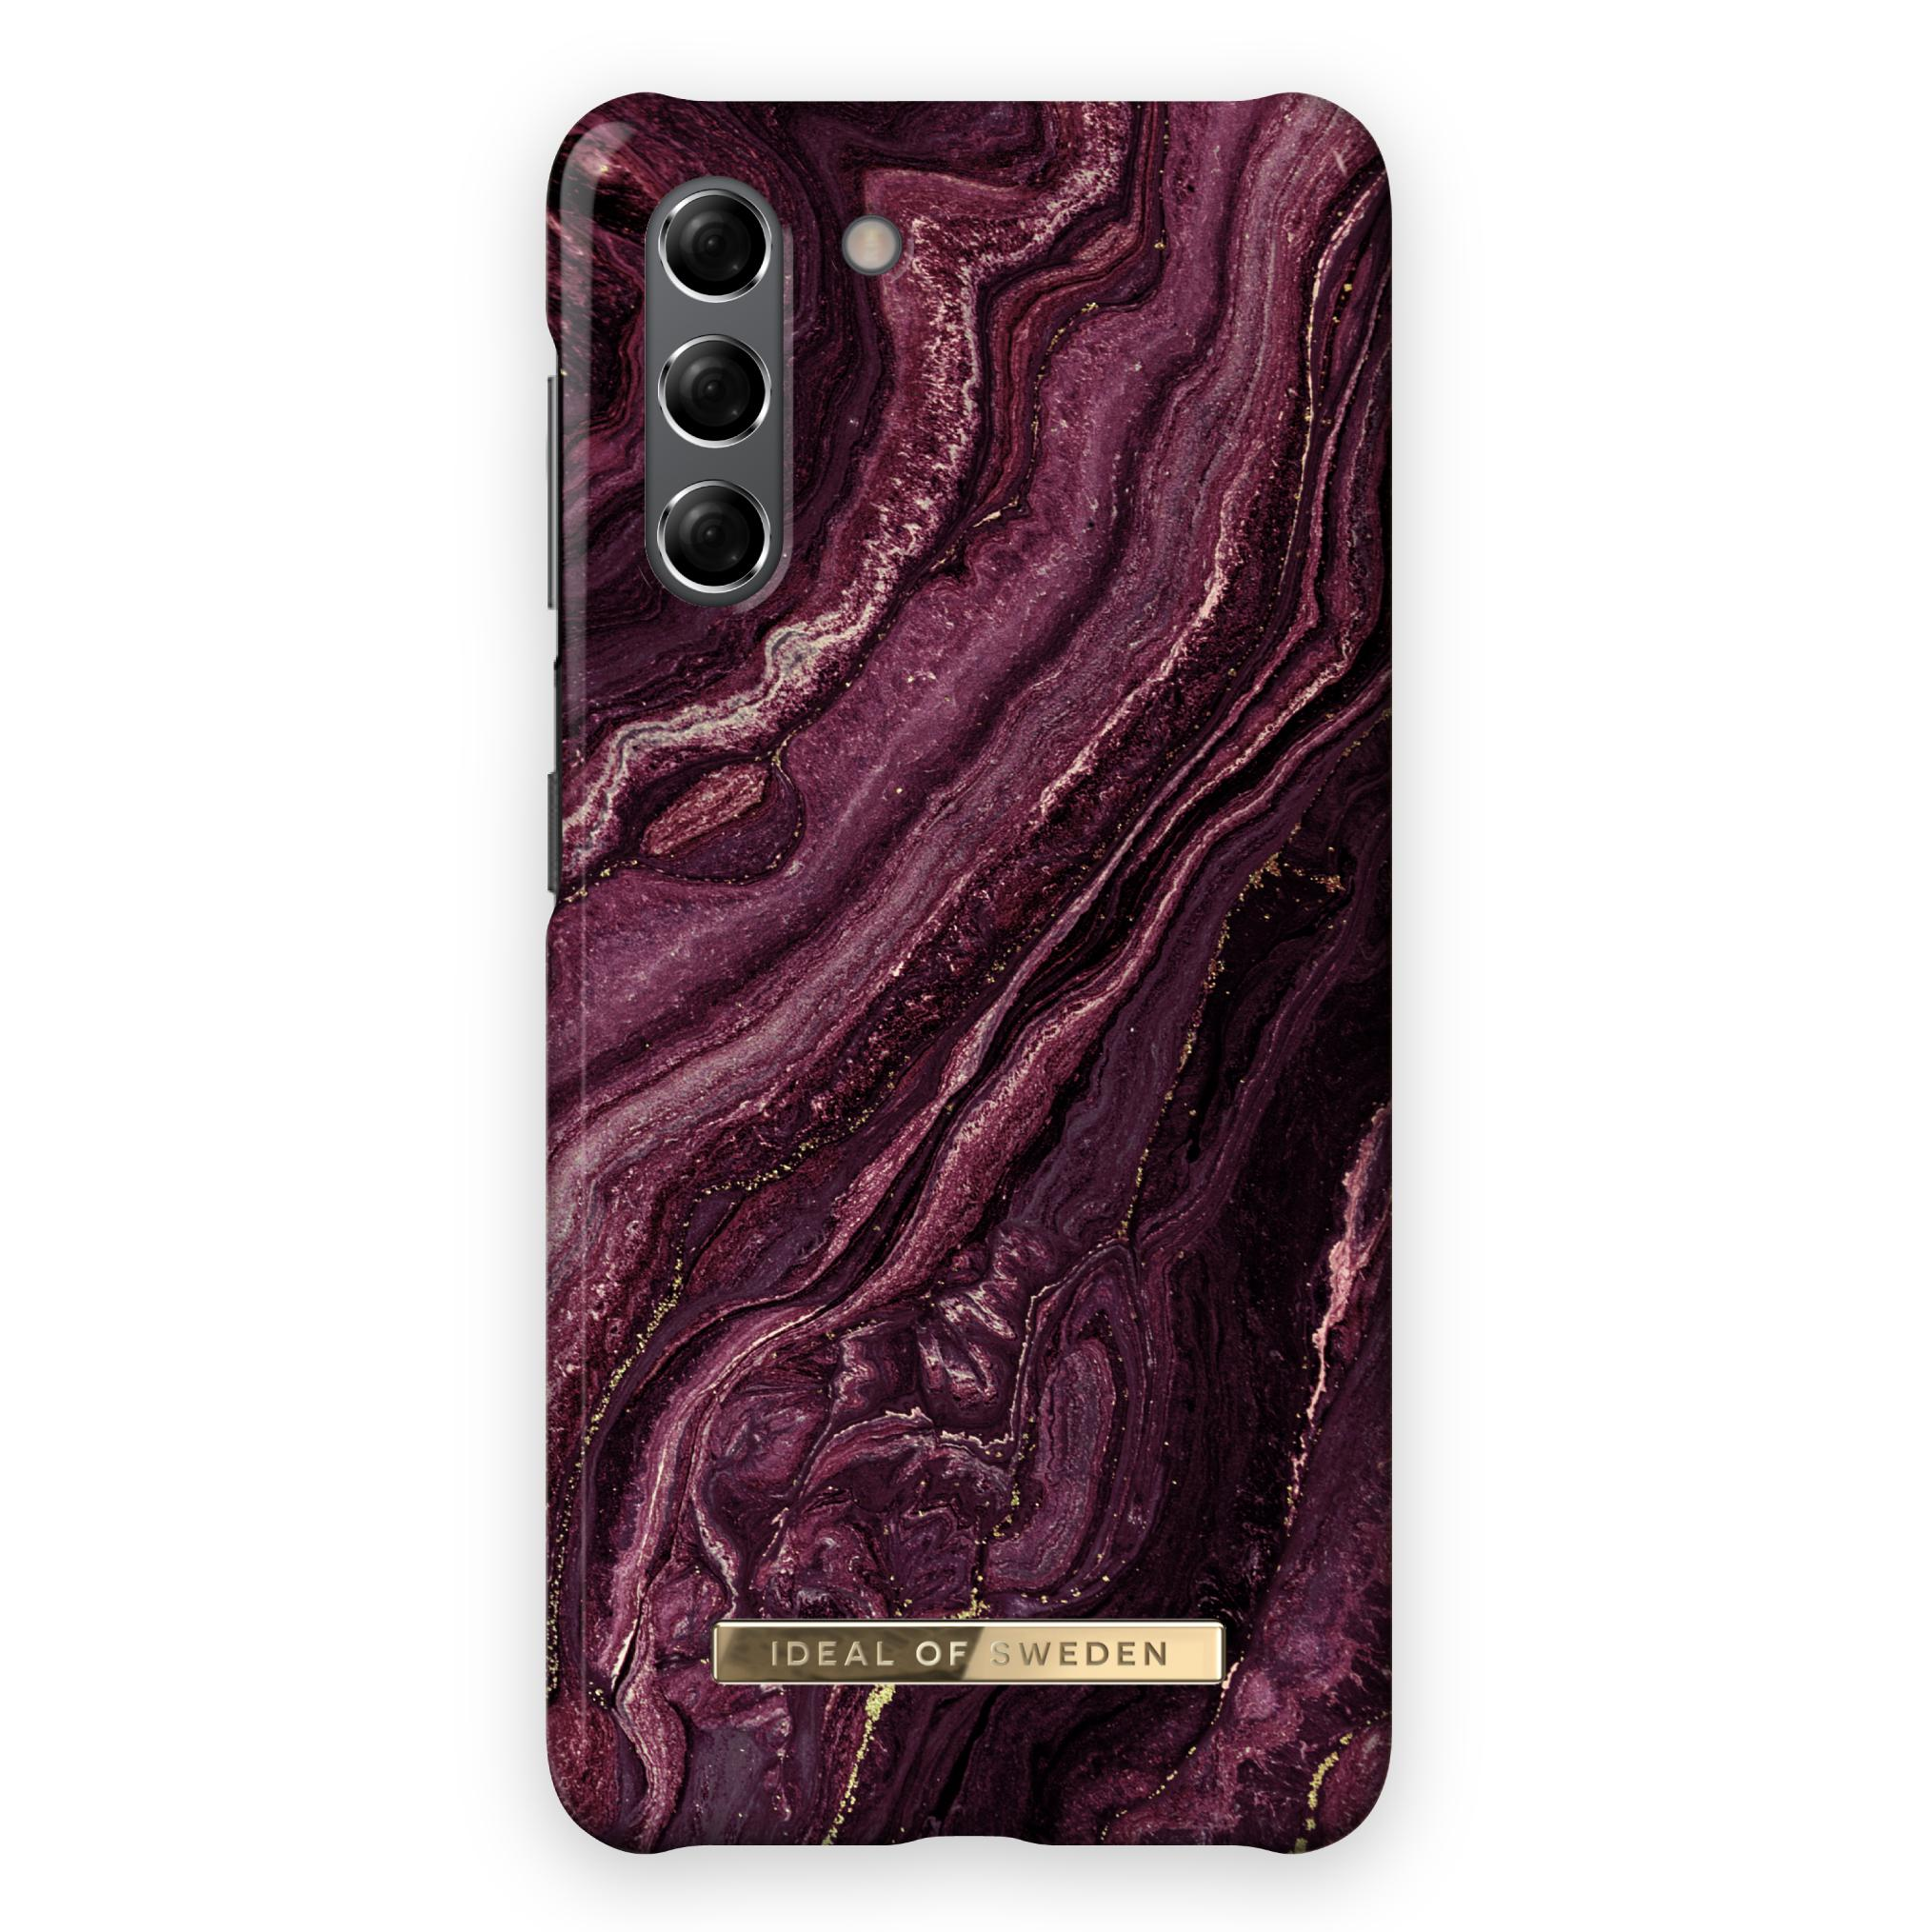 Fashion Case Galaxy S21 Plus Golden Plum